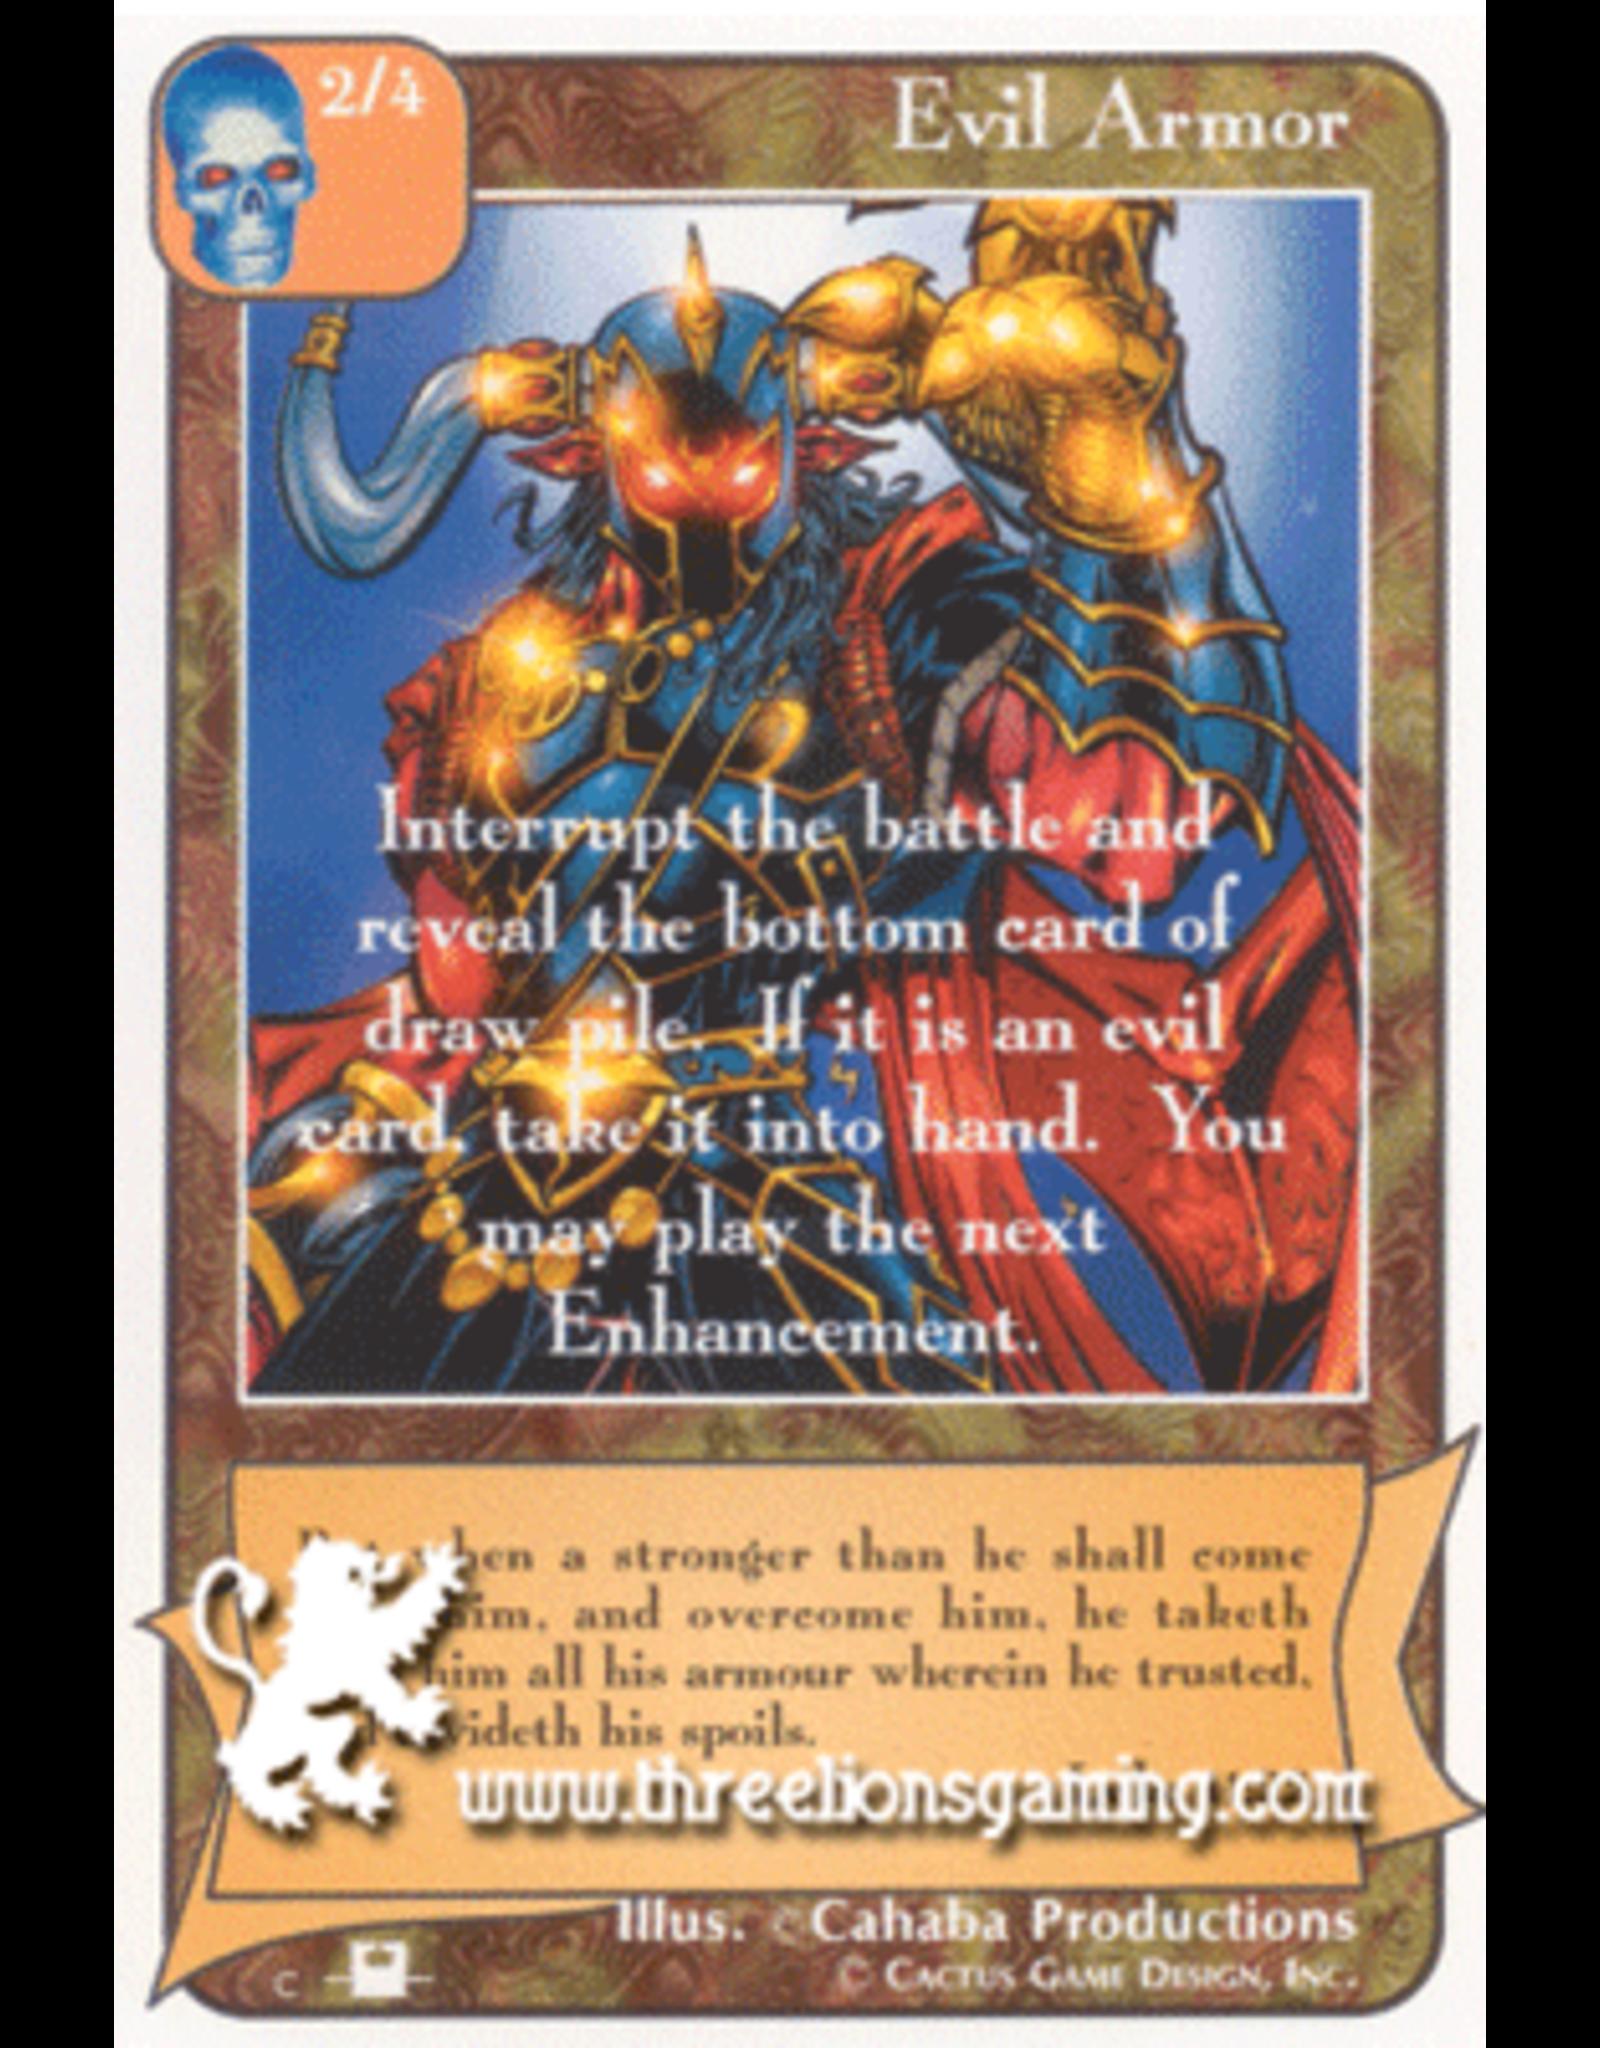 Priest: Evil Armor